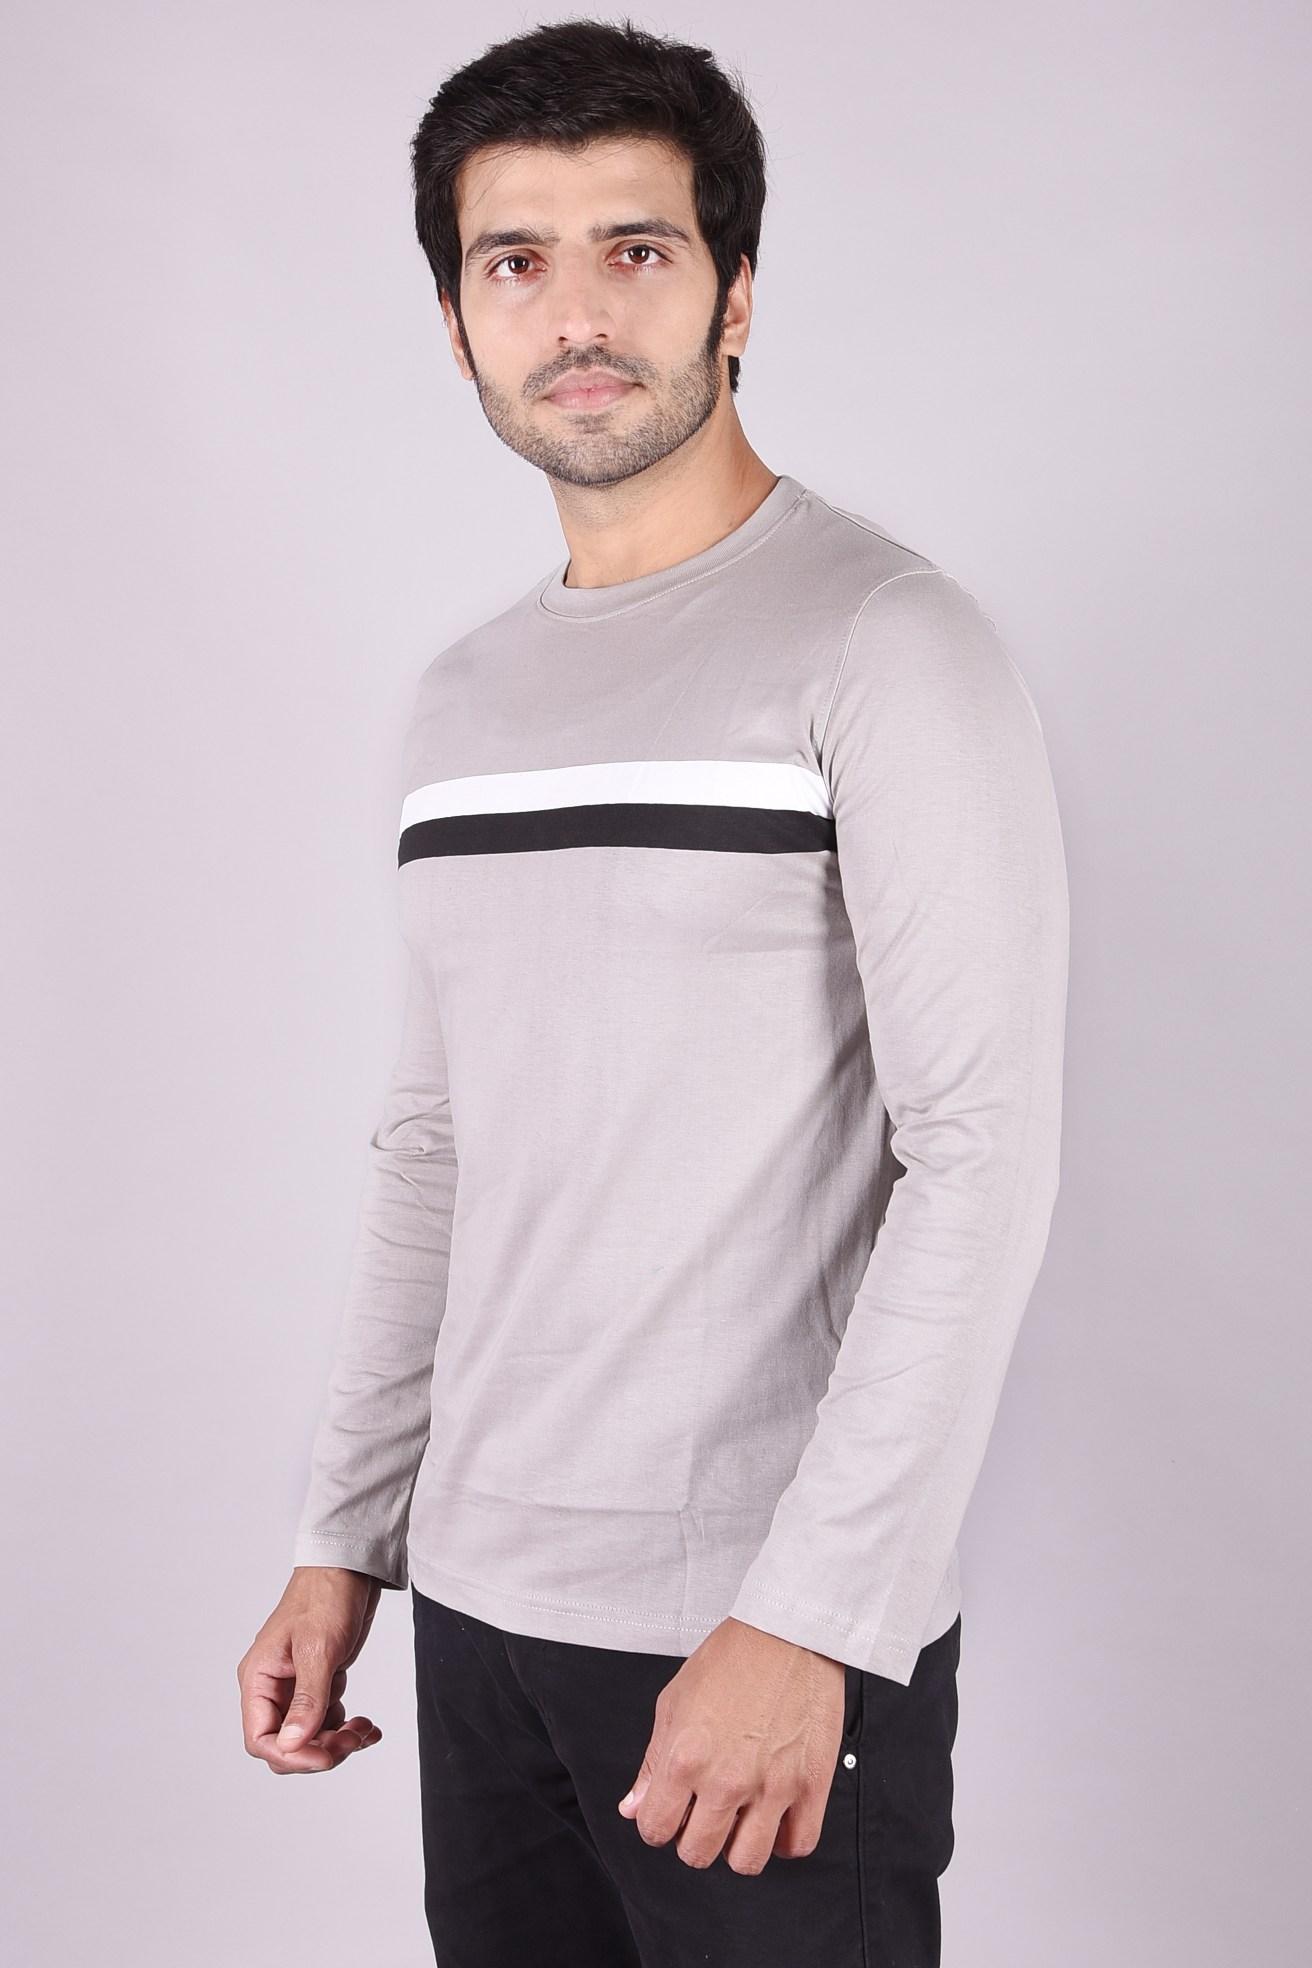 JAGURO | Stylish full Sleeves cotton Printed T-shirt.